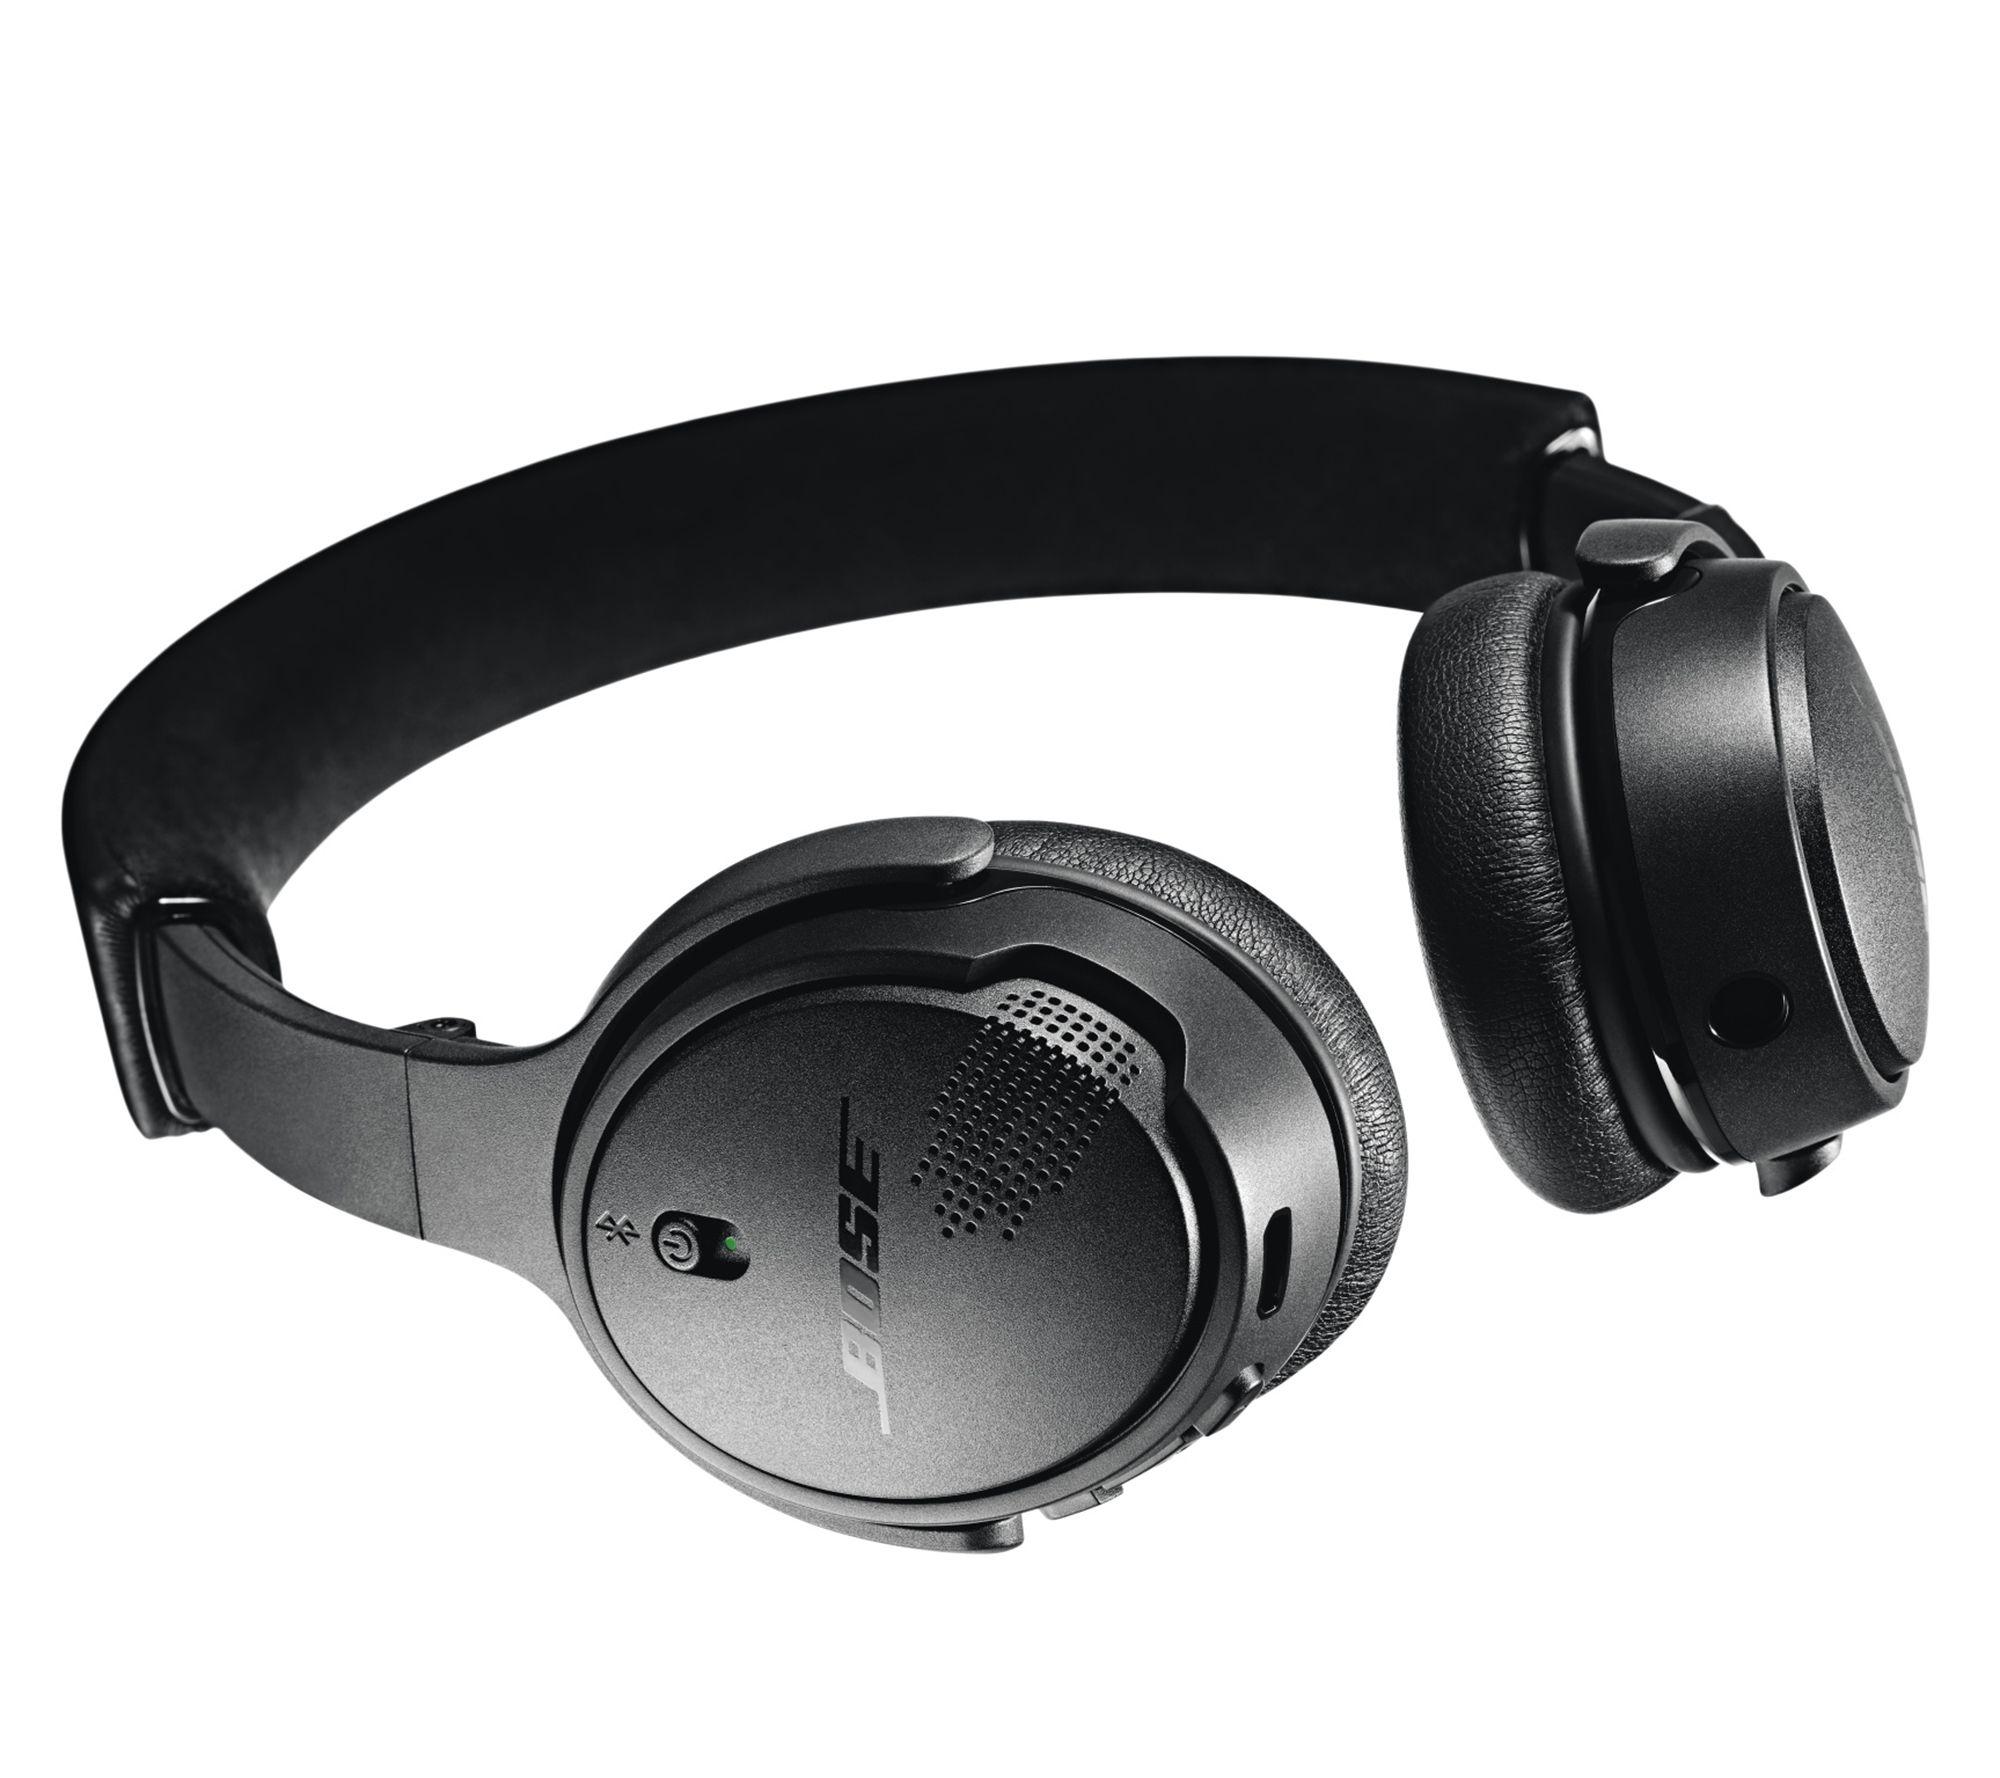 Bose On-Ear Wireless Bluetooth Headphones $89.96 + FS @QVC